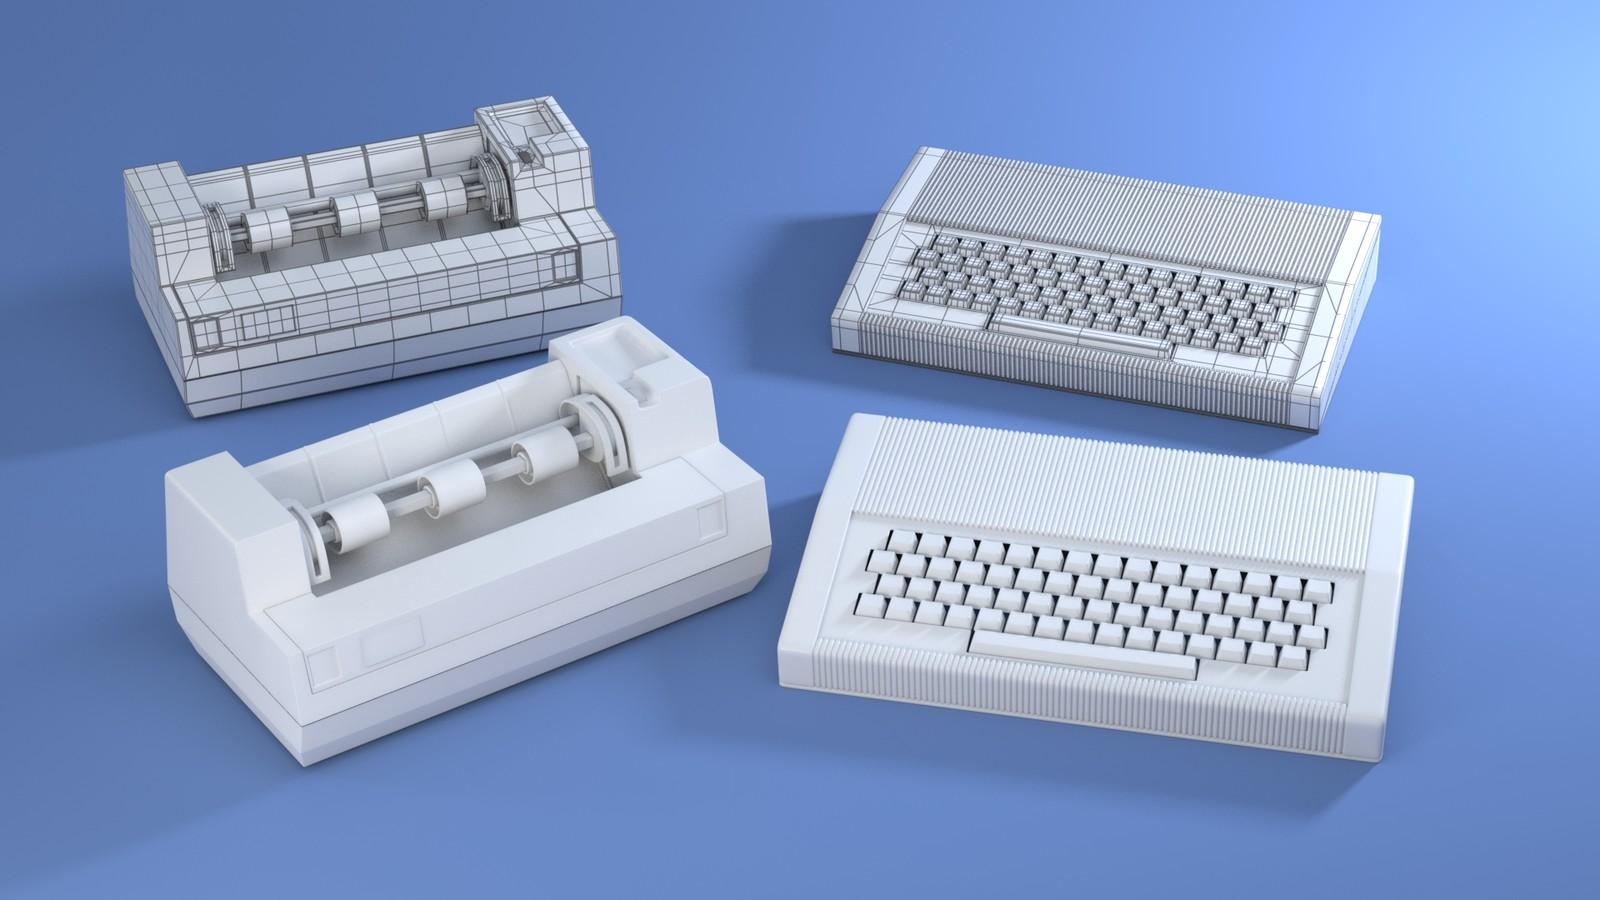 Computer and Printer (1980's)